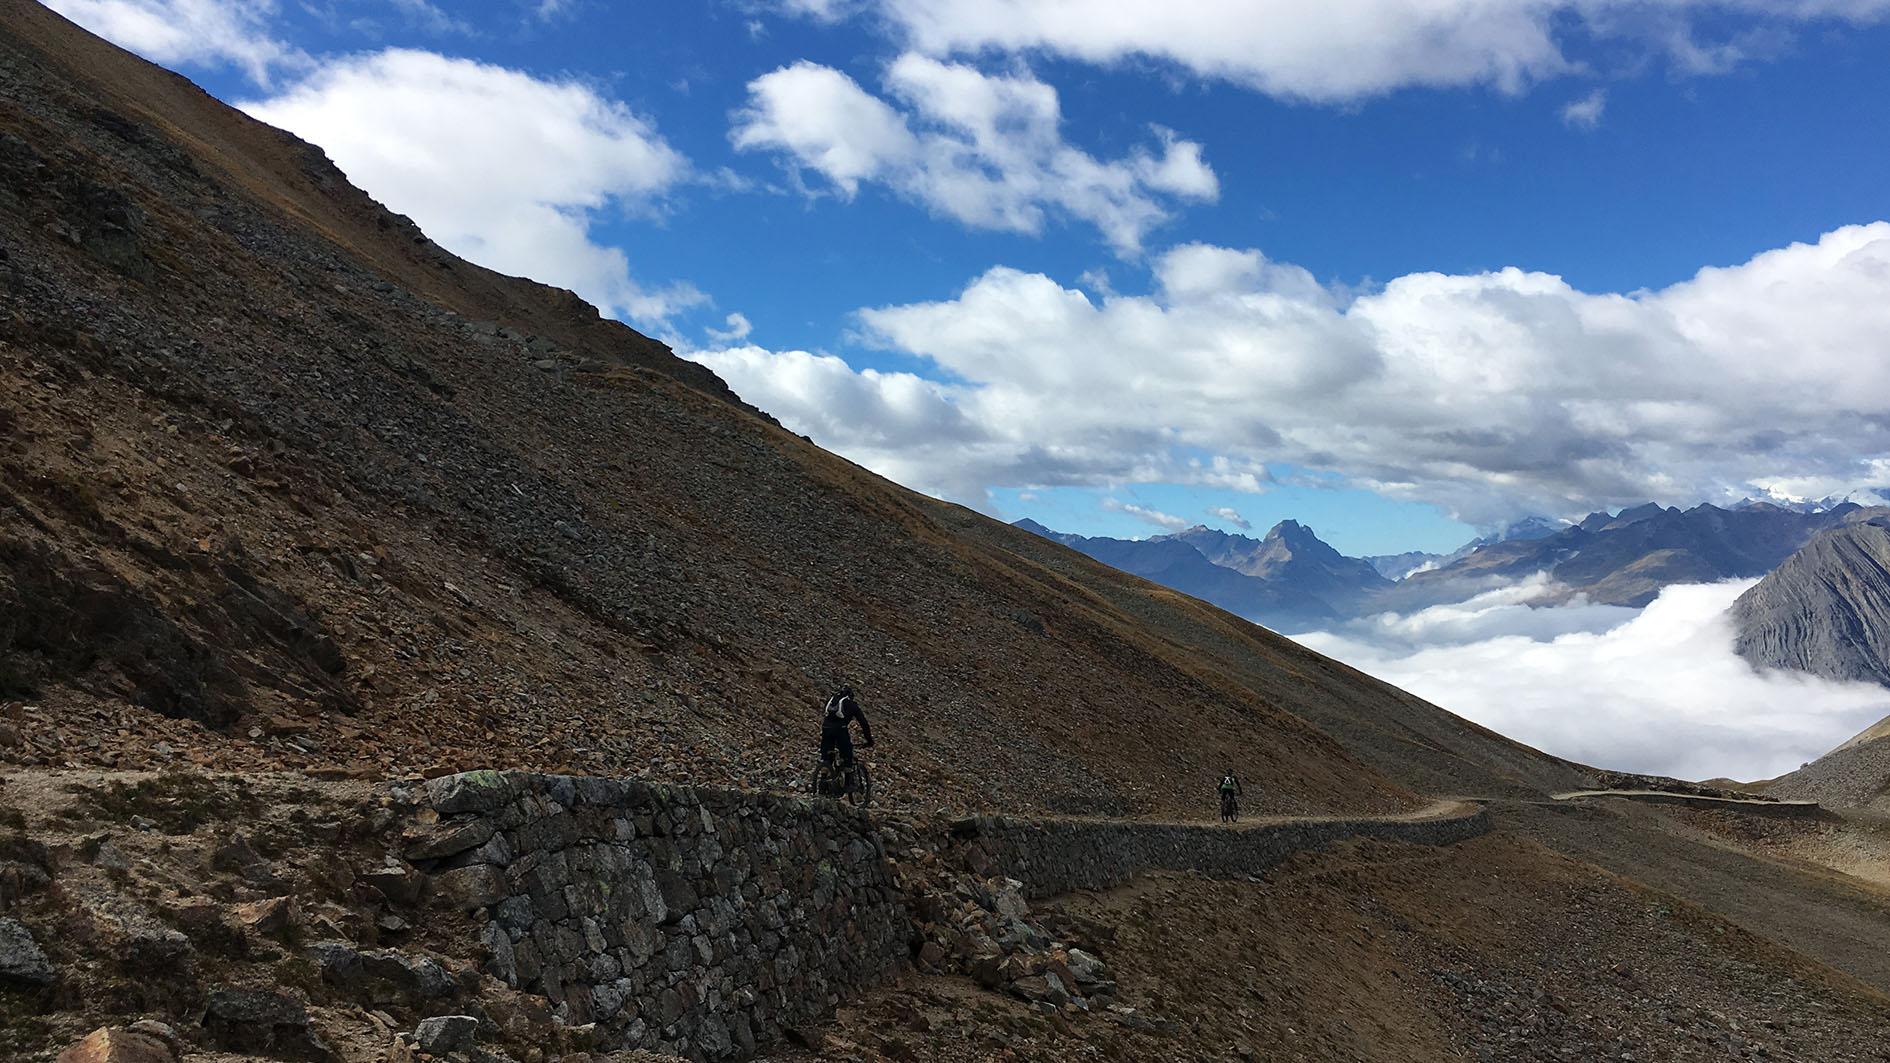 Touren - BERGFEX - Engadin Val Mstair - Mountainbike